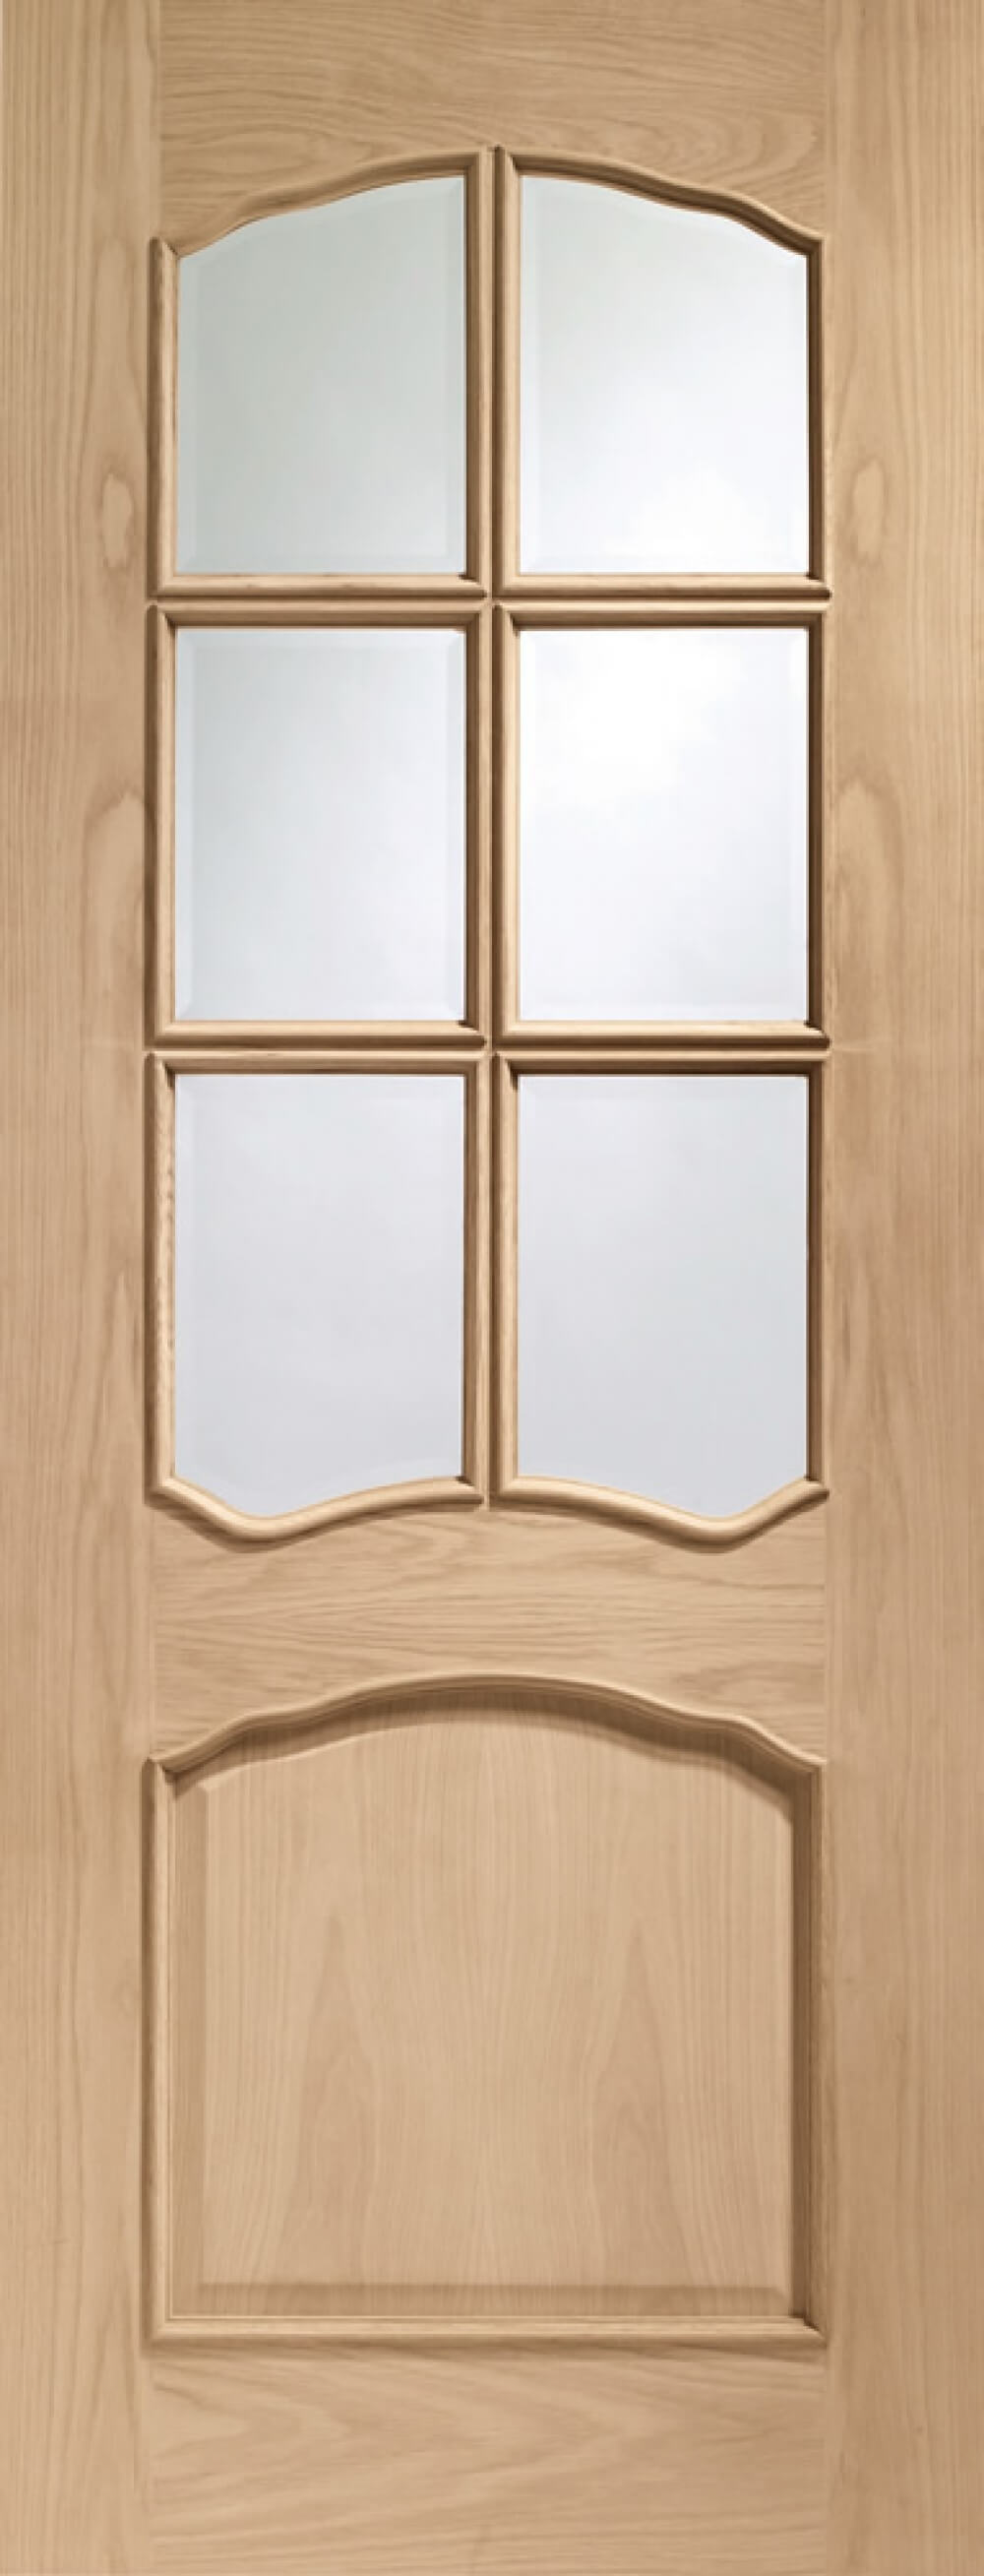 Riviera Oak Glazed Door Rm2S - Xl - PREFINISHED